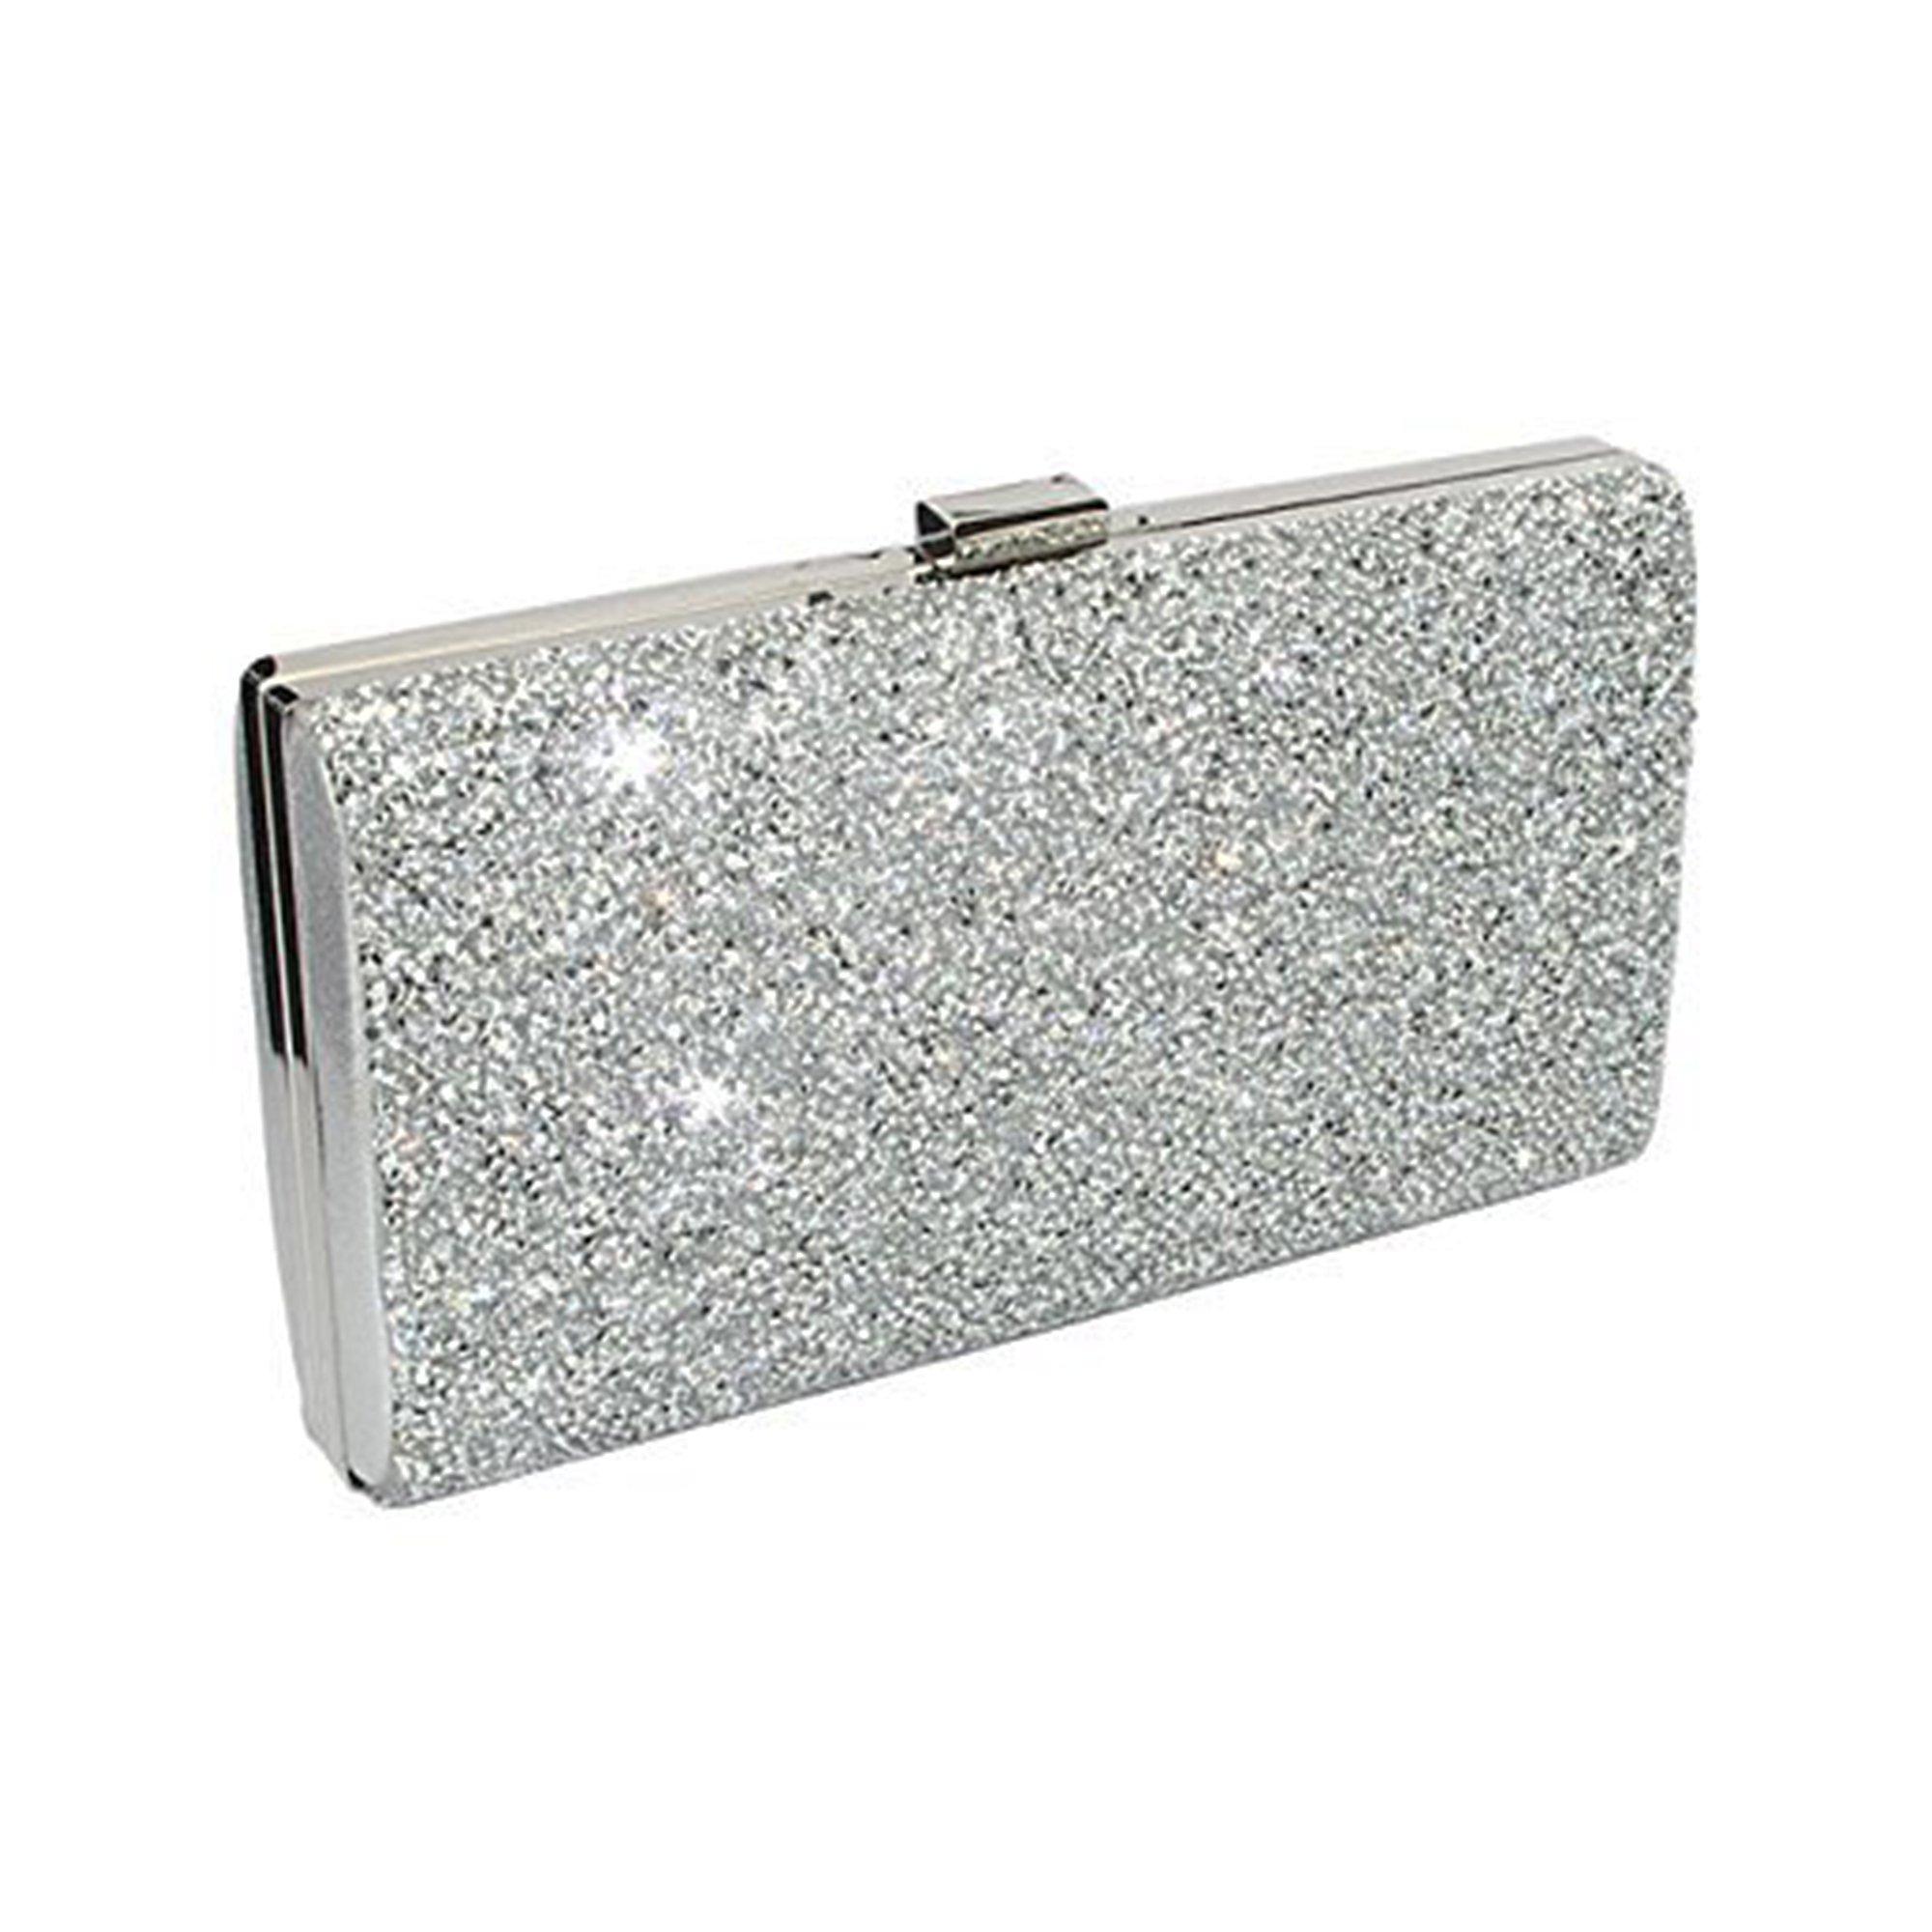 ChilMo Ladies Rhinestone Clutch Purse Sparkling Evening Handbags For Wedding Prom Bride,Silver